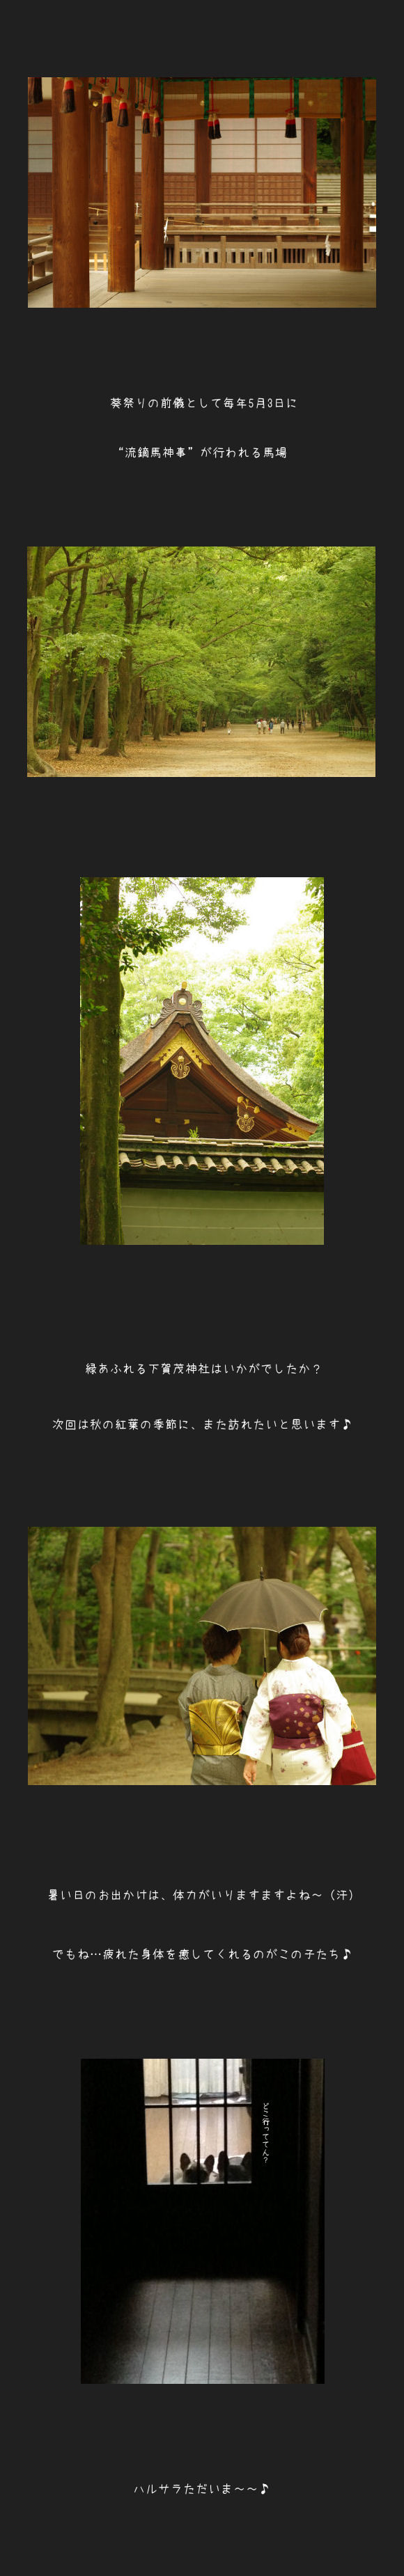 下賀茂神社C